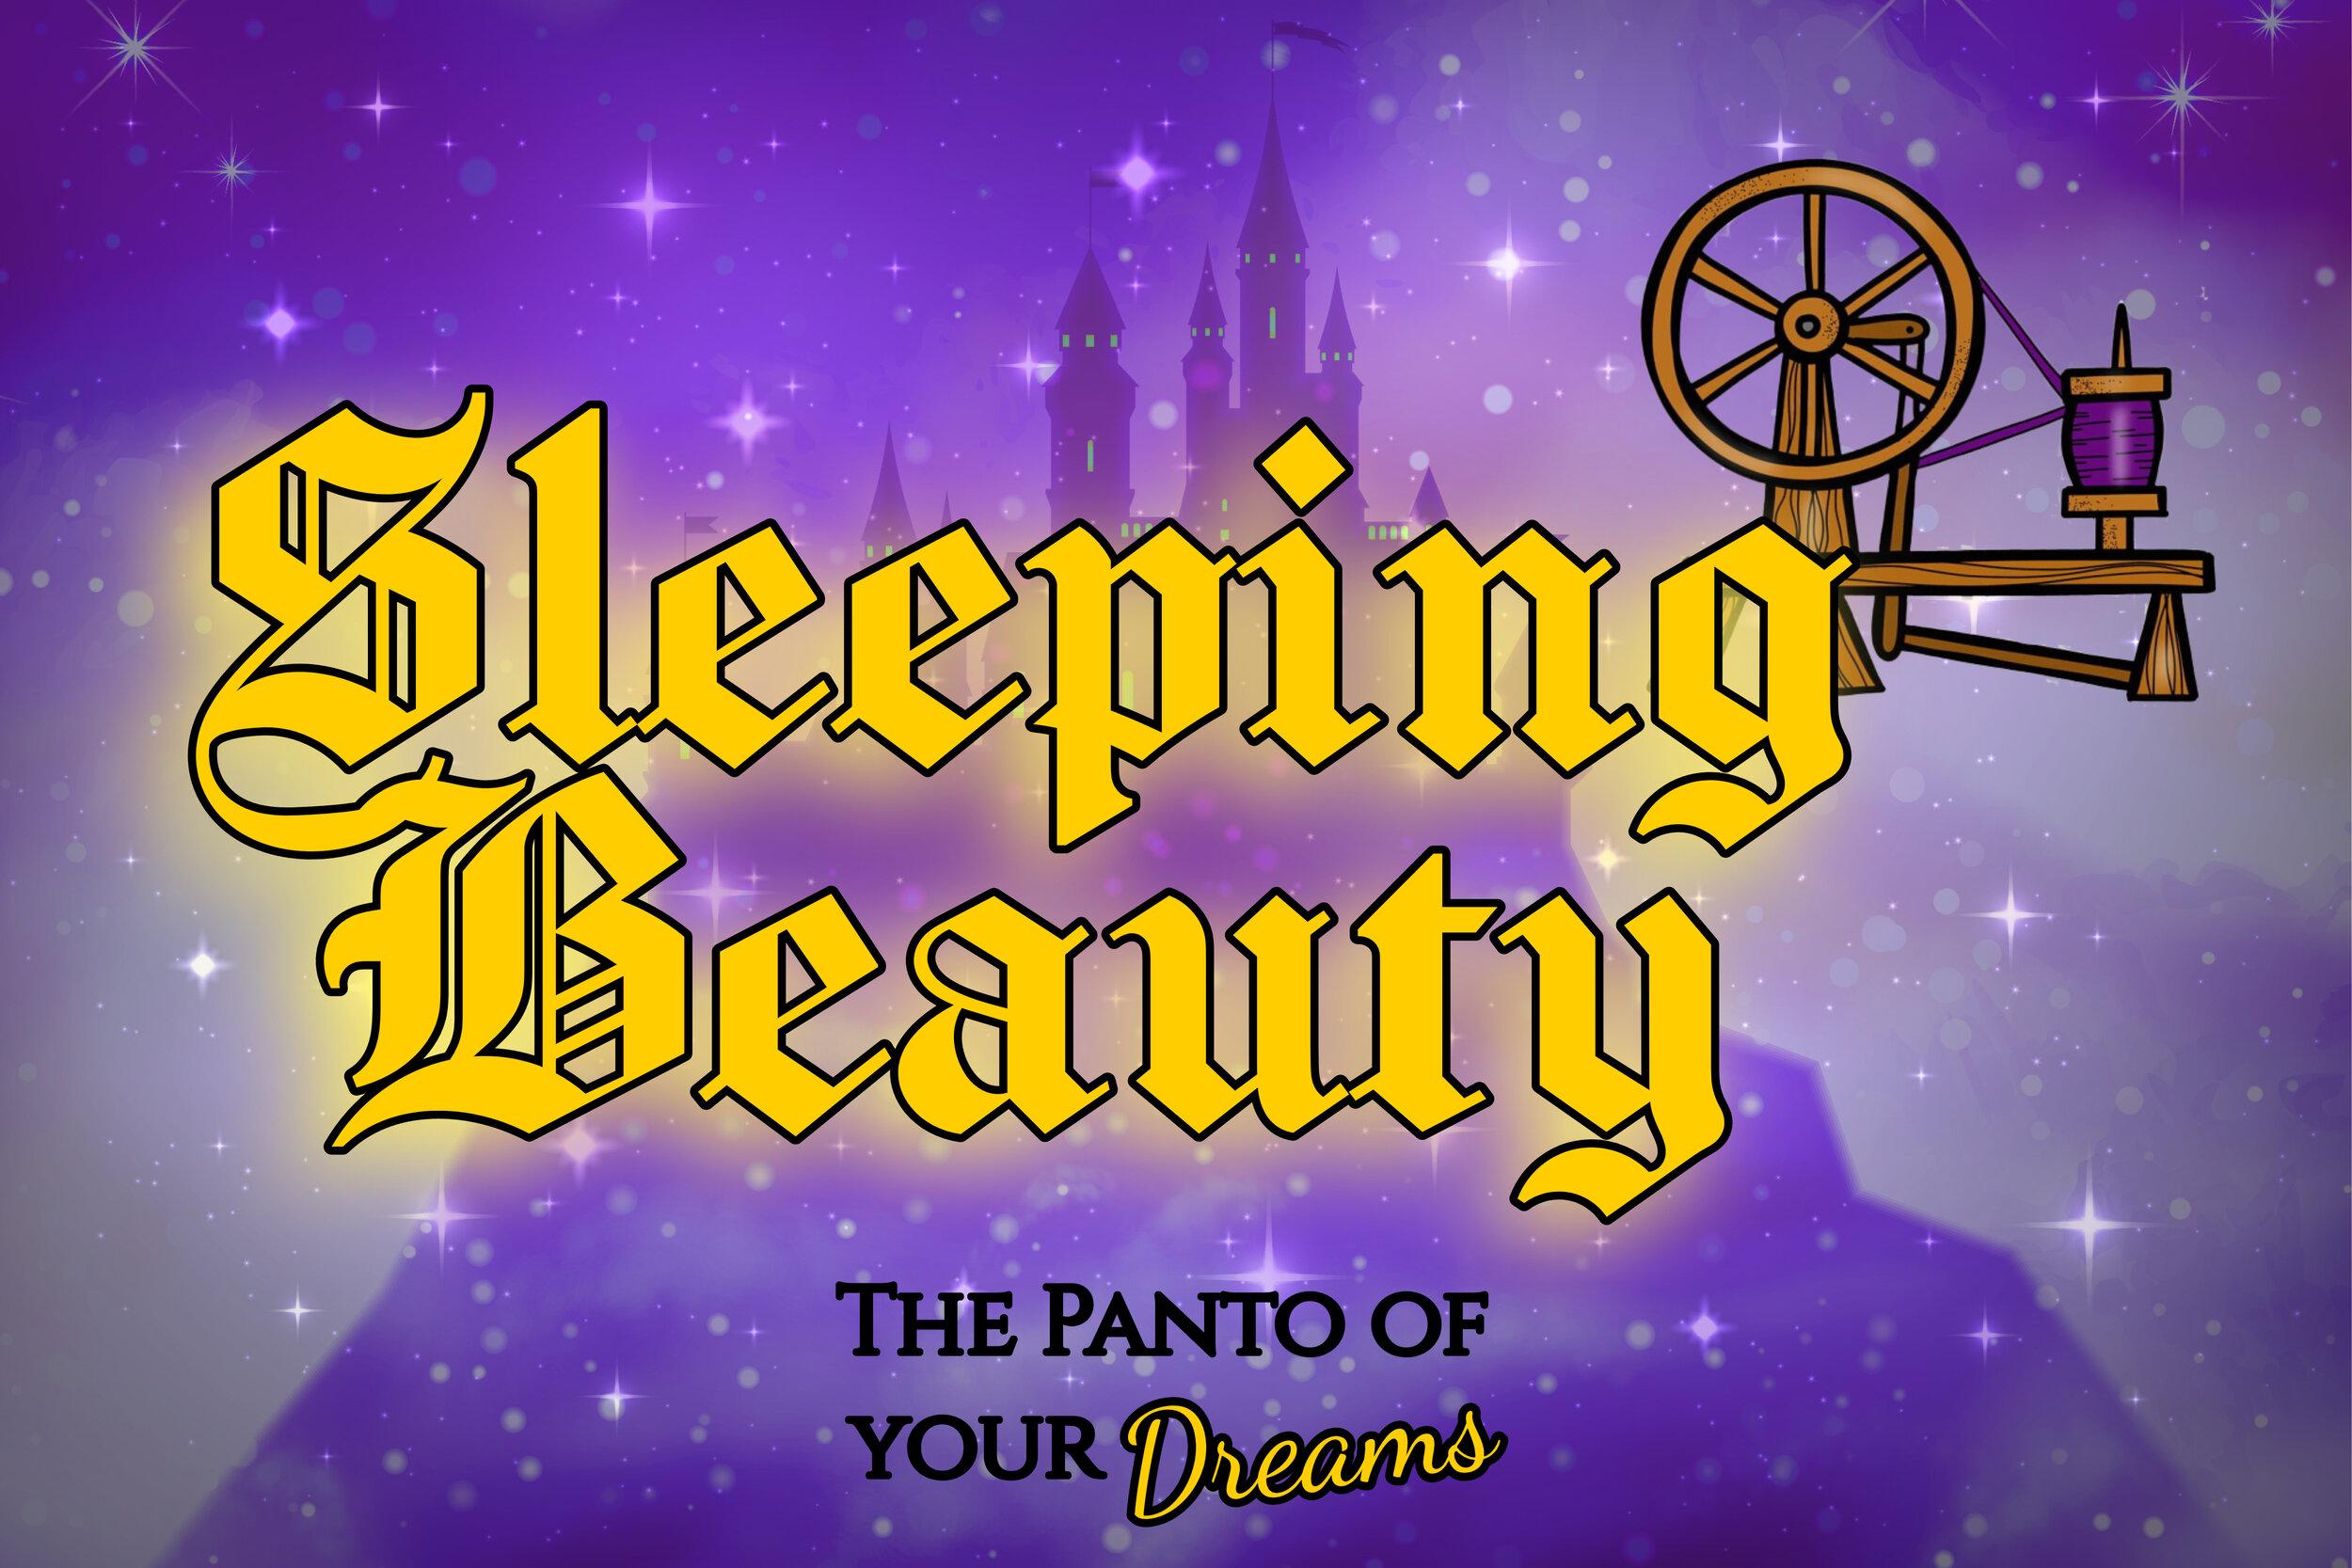 Sleeping Beauty 2019.jpg